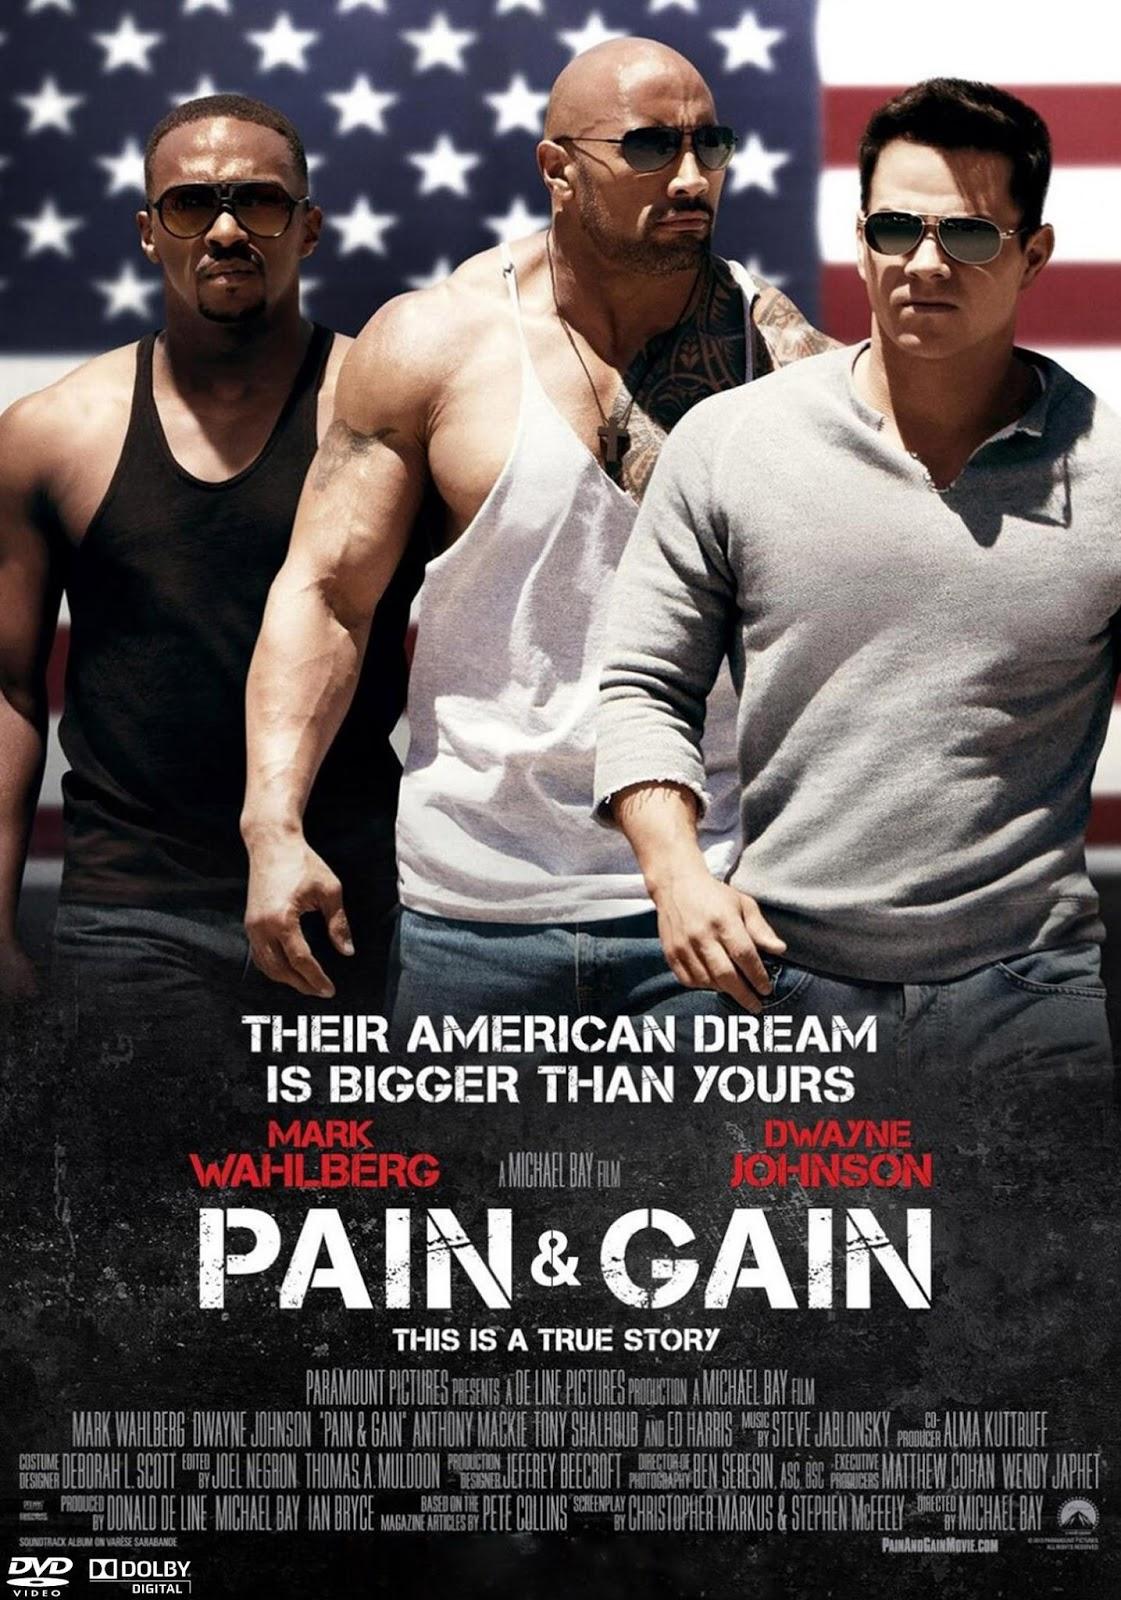 http://2.bp.blogspot.com/-DdHFuvLK1PE/Uhum_ruDbvI/AAAAAAAAA_0/QzkVdjcNBeA/s1600/pain+and+gain.jpg